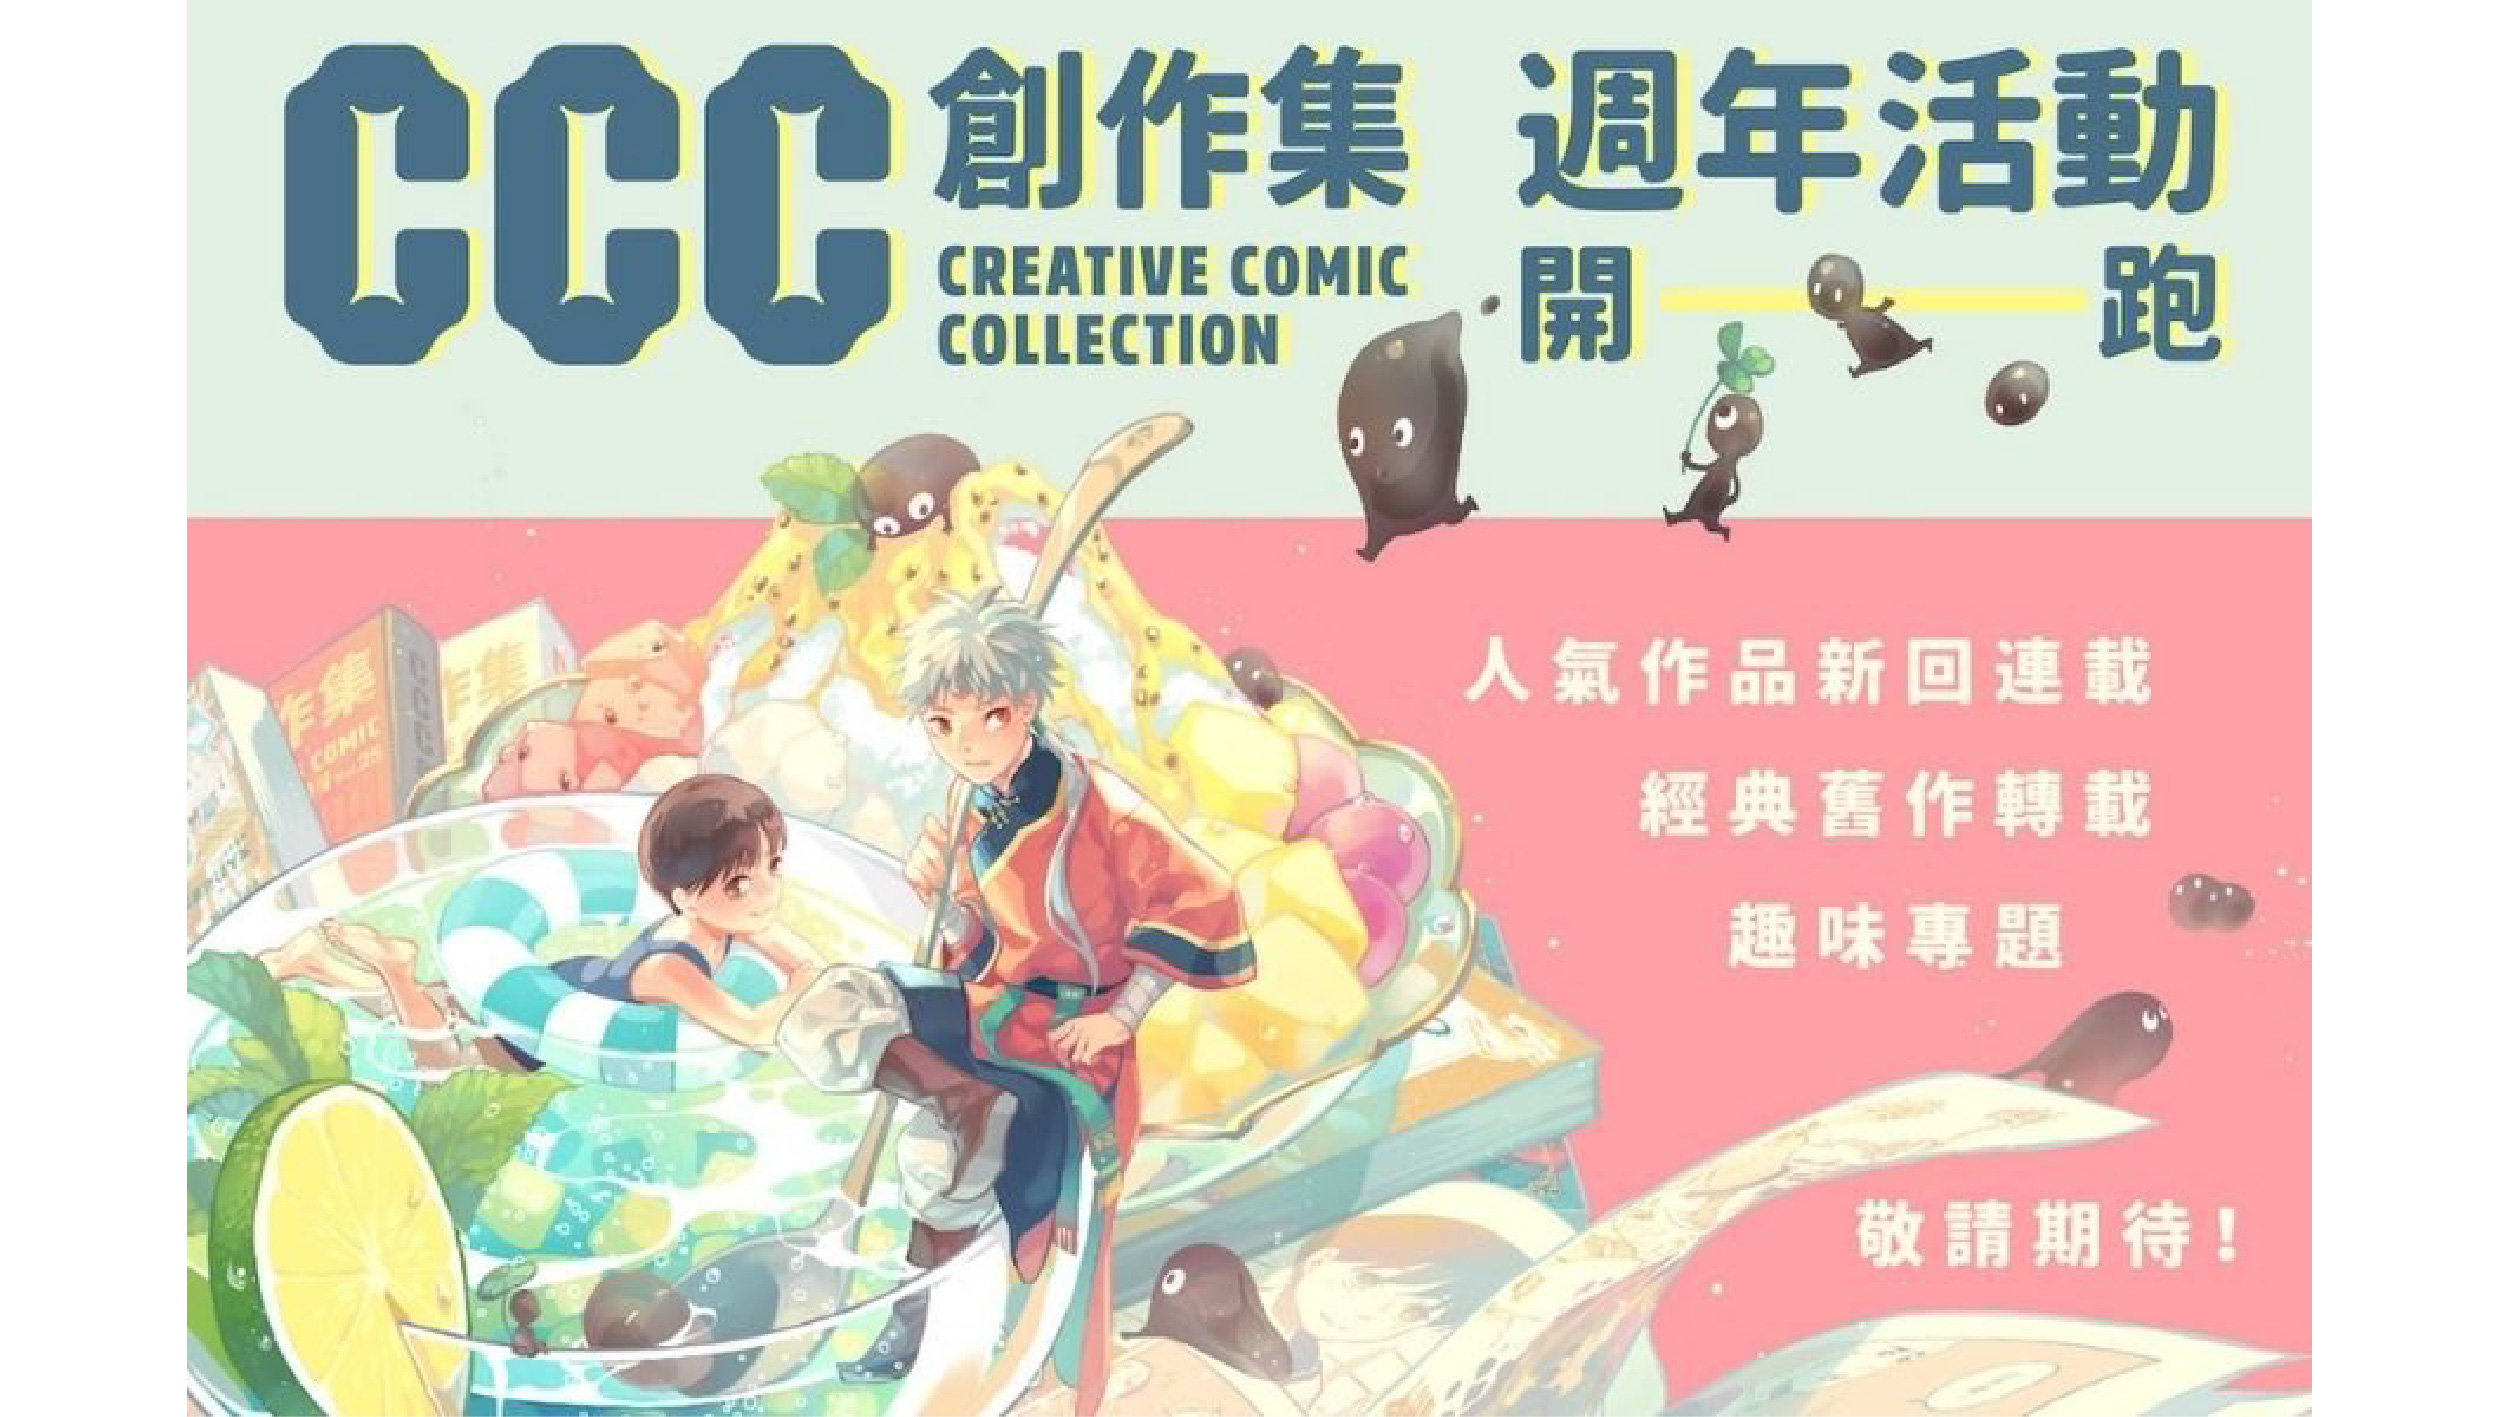 《CCC創作集》數位平台滿週年! 臺漫史料轉譯精神維持,續擴大提案貼近市場!